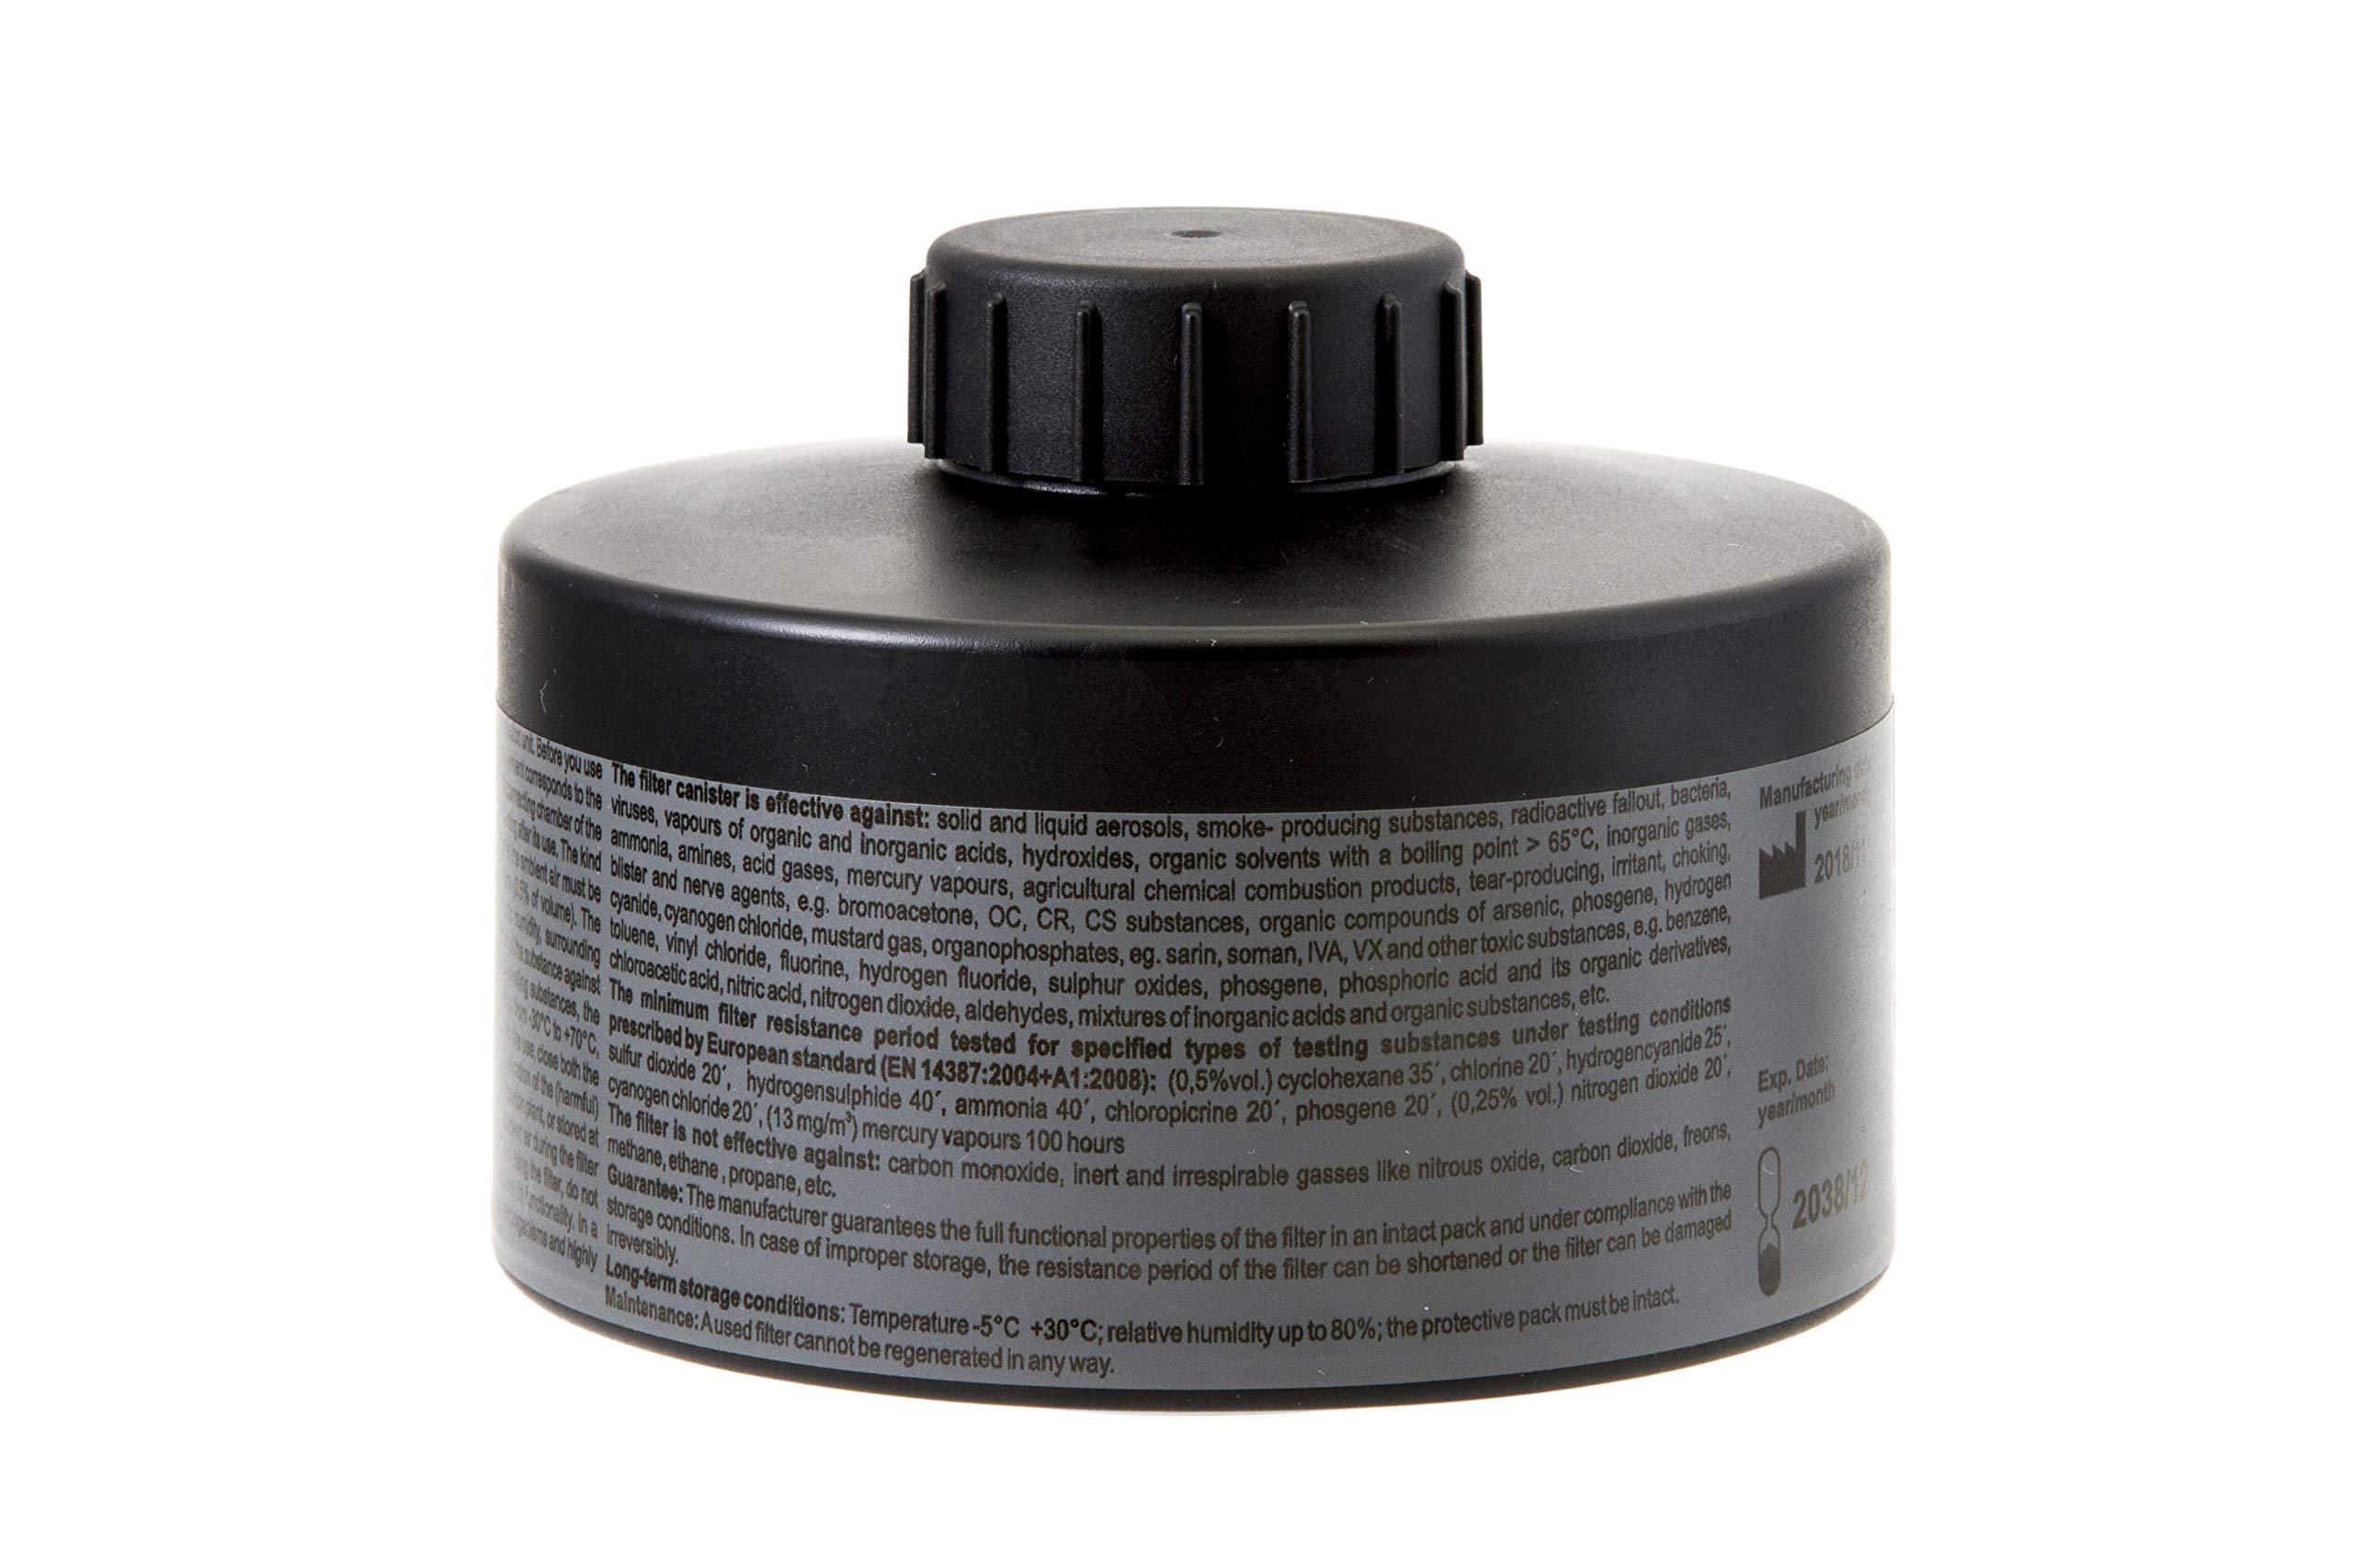 MIRA Multi Gas Vapor Cartridge Respiratory Protection 20 Years Shelf Life CBRN NBC Grade (Mira Filter) by MIRA SAFETY M (Image #2)